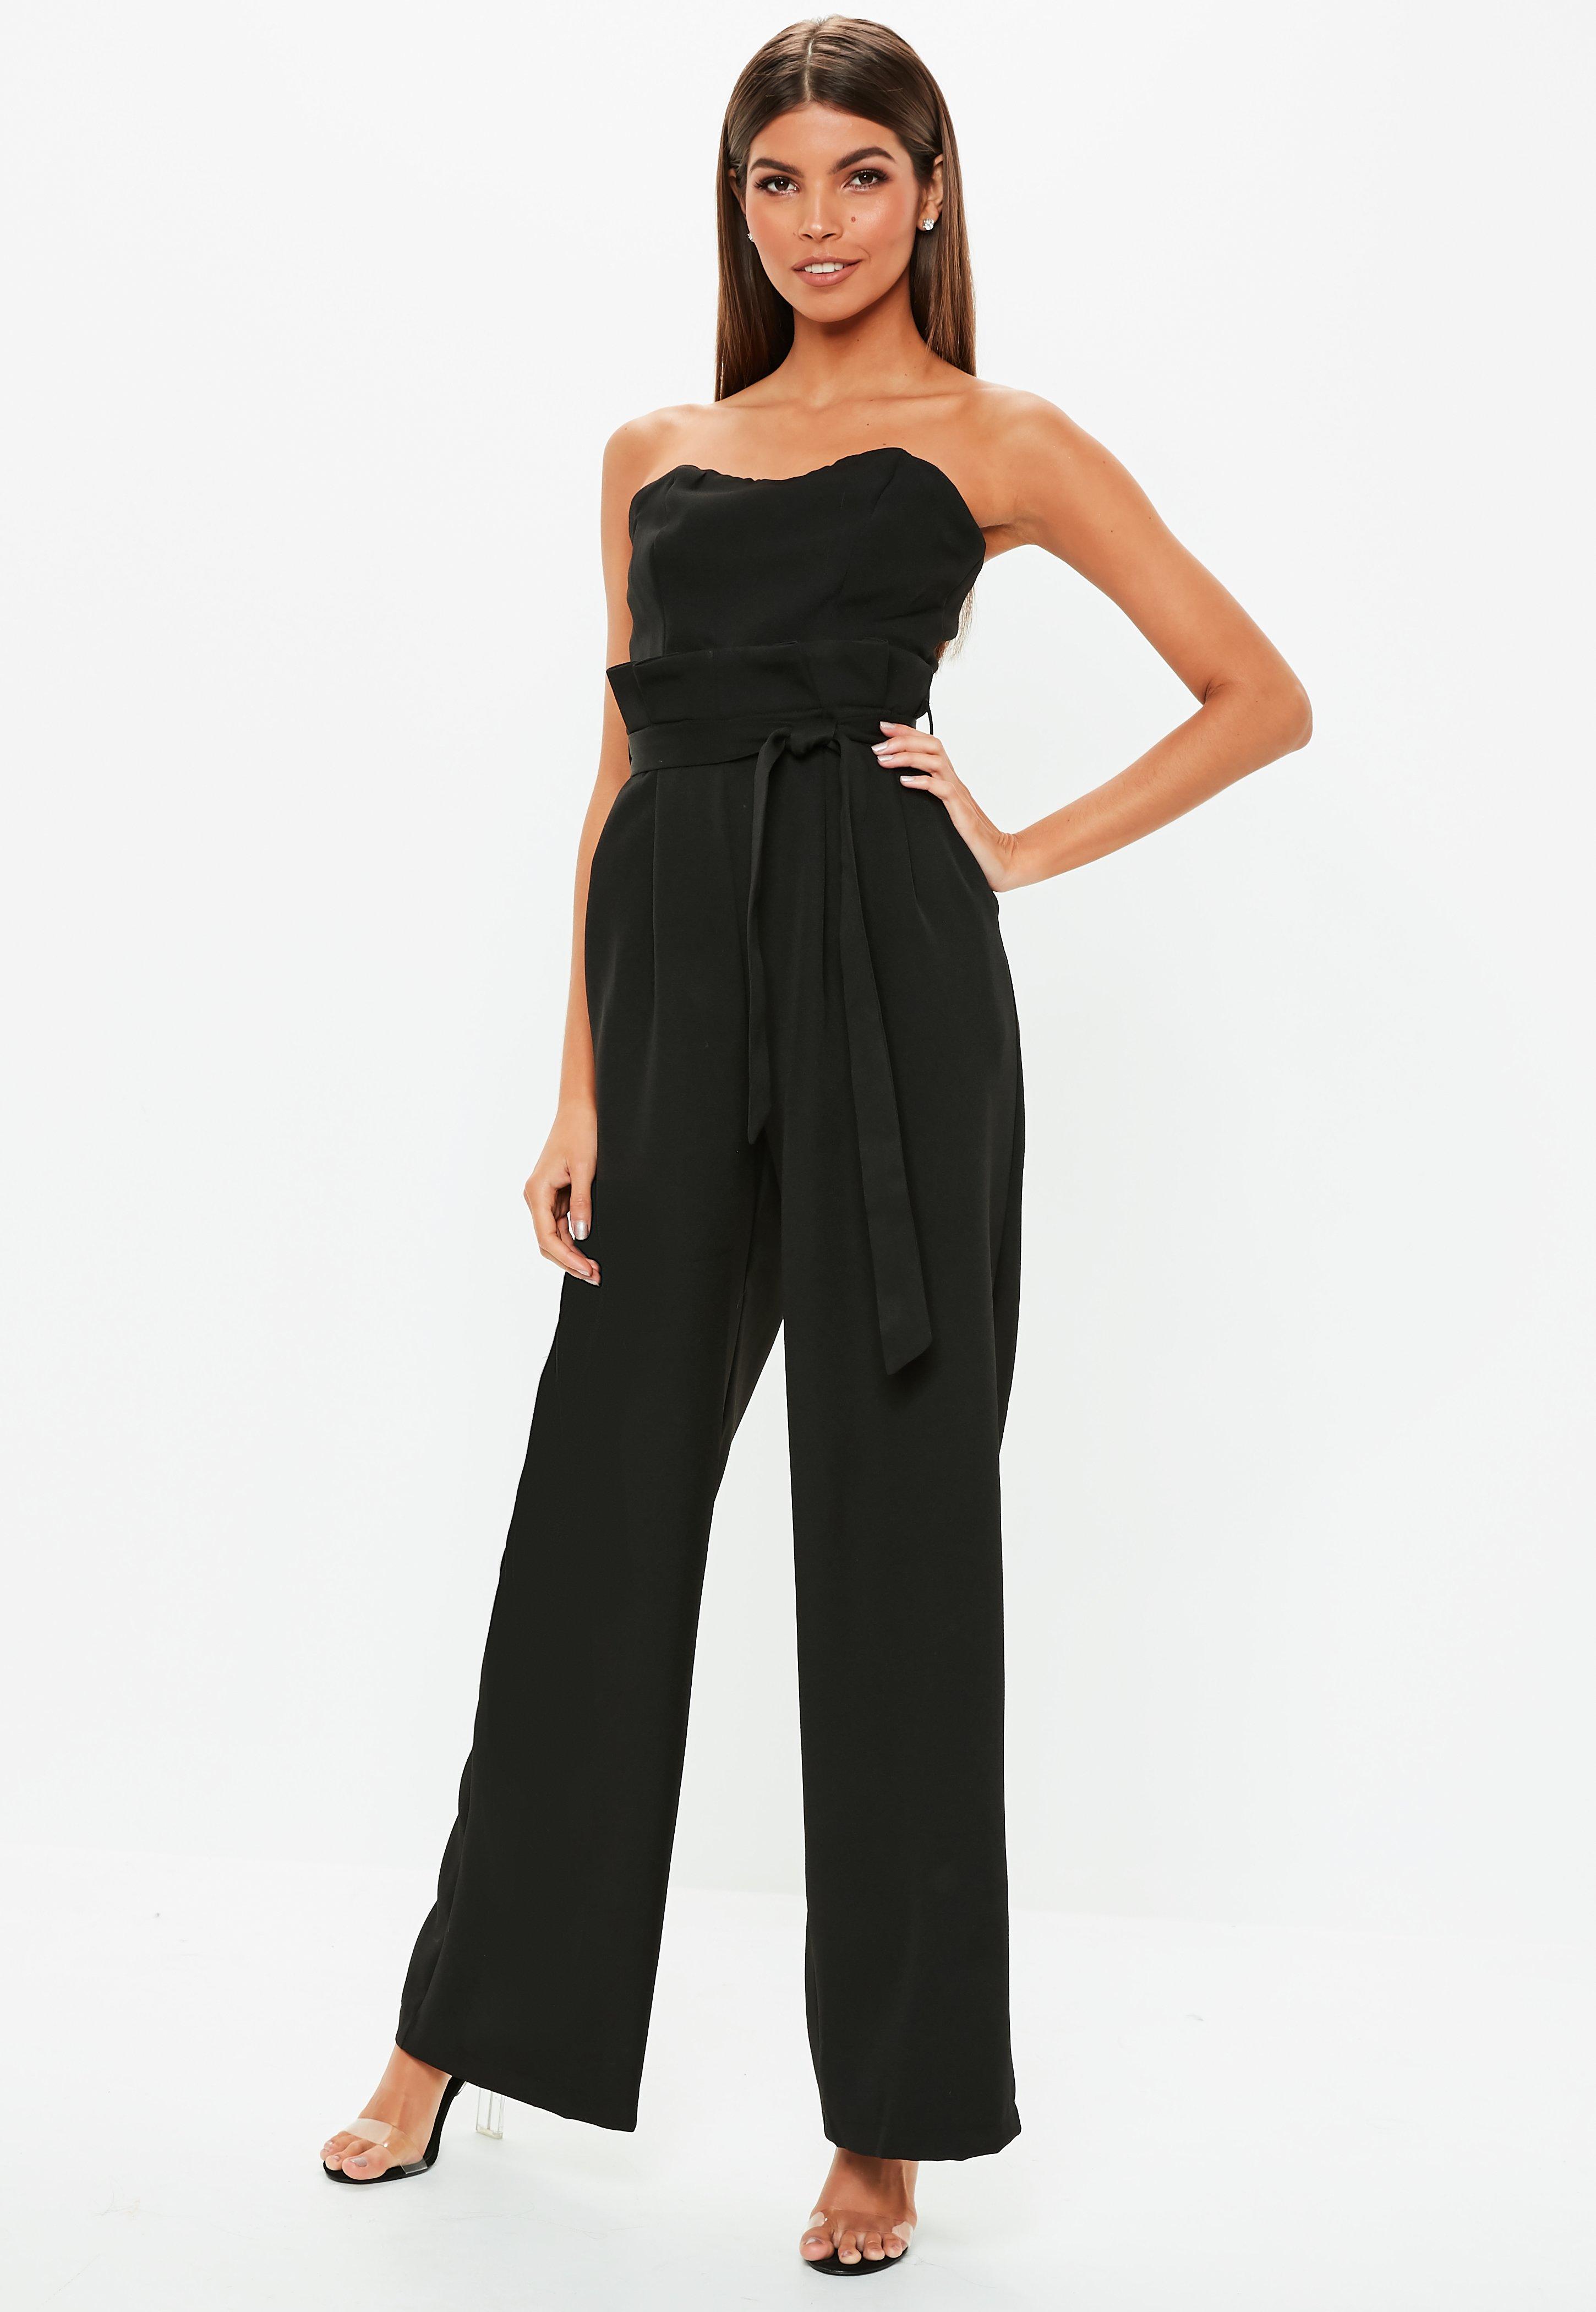 8500d042db6 Black Jumpsuits Online - Missguided